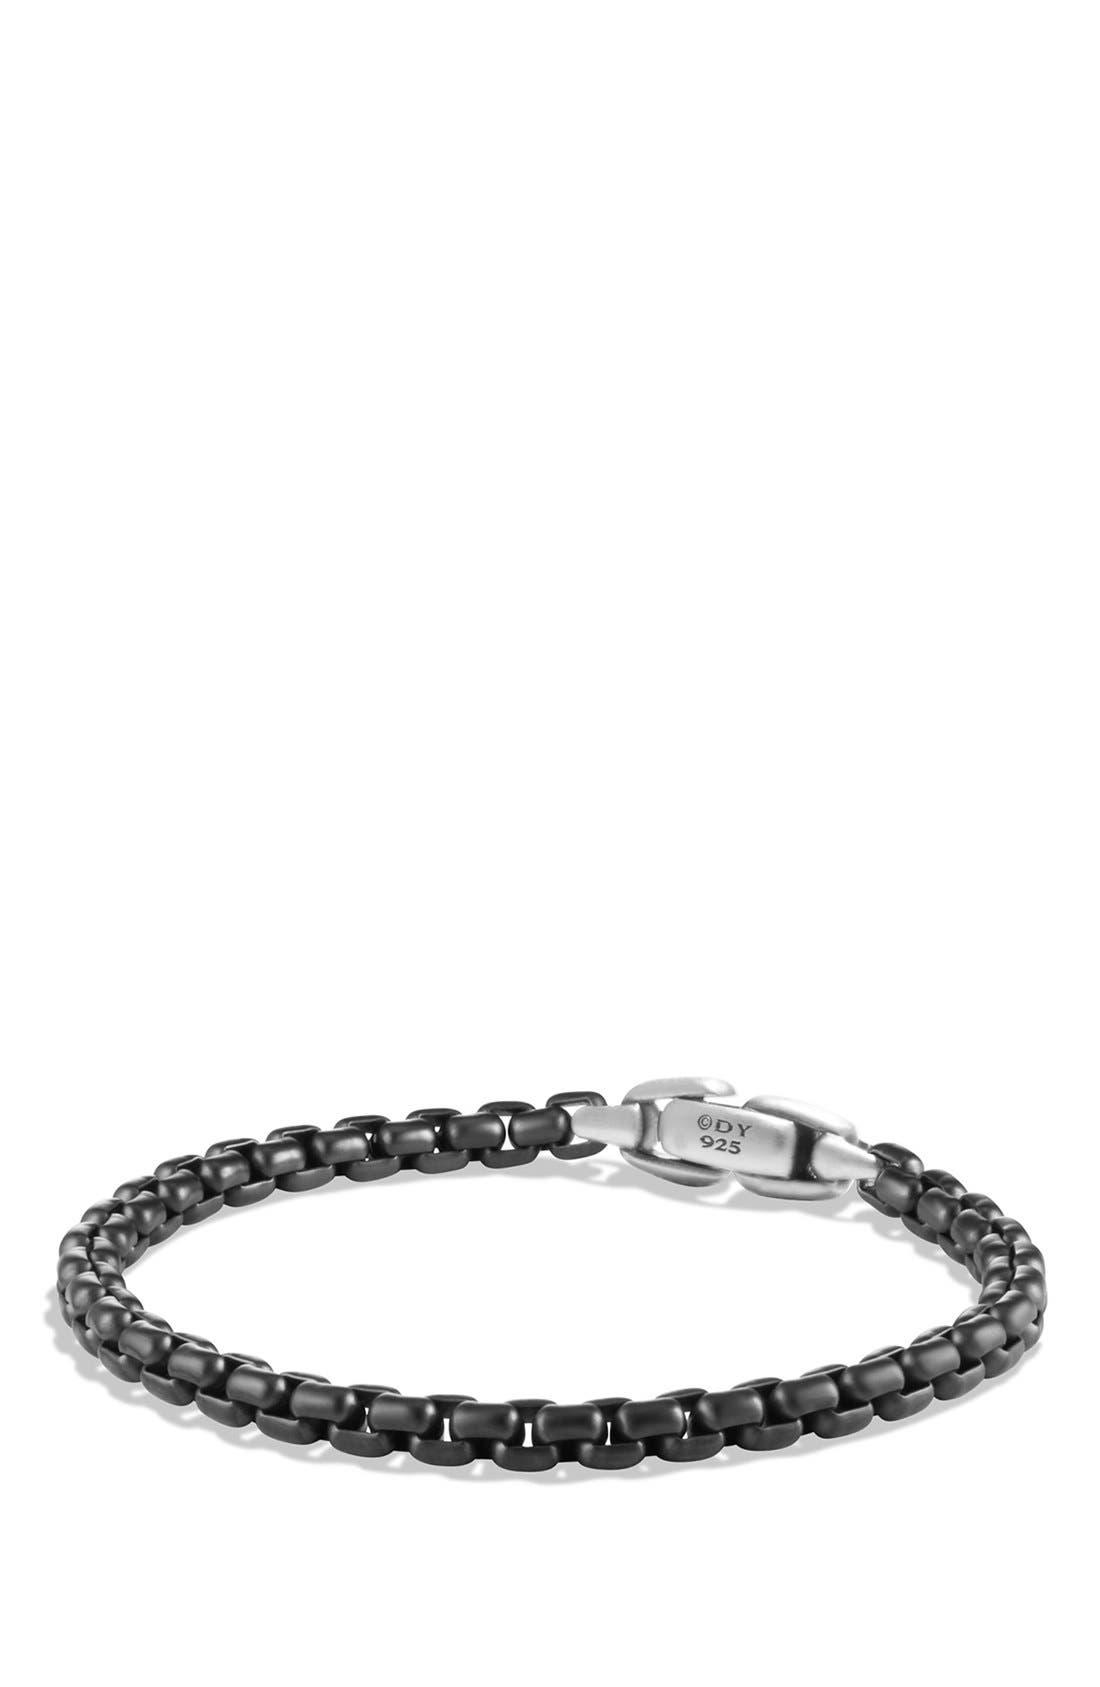 Box Chain Bracelet,                             Main thumbnail 1, color,                             STAINLESS STEEL